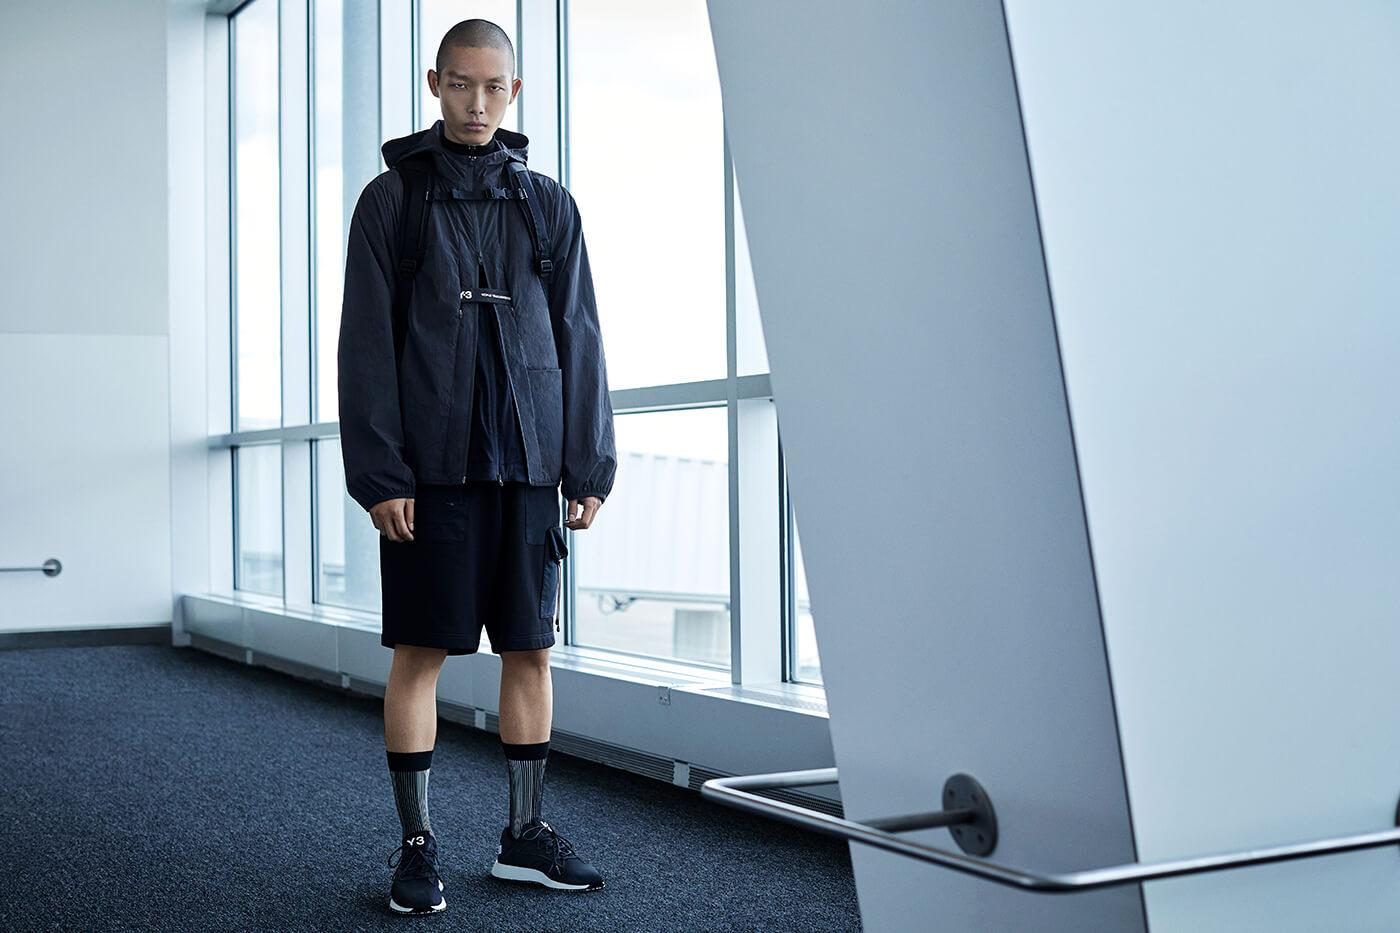 adidas-y3-johan-sandberg-airport-01